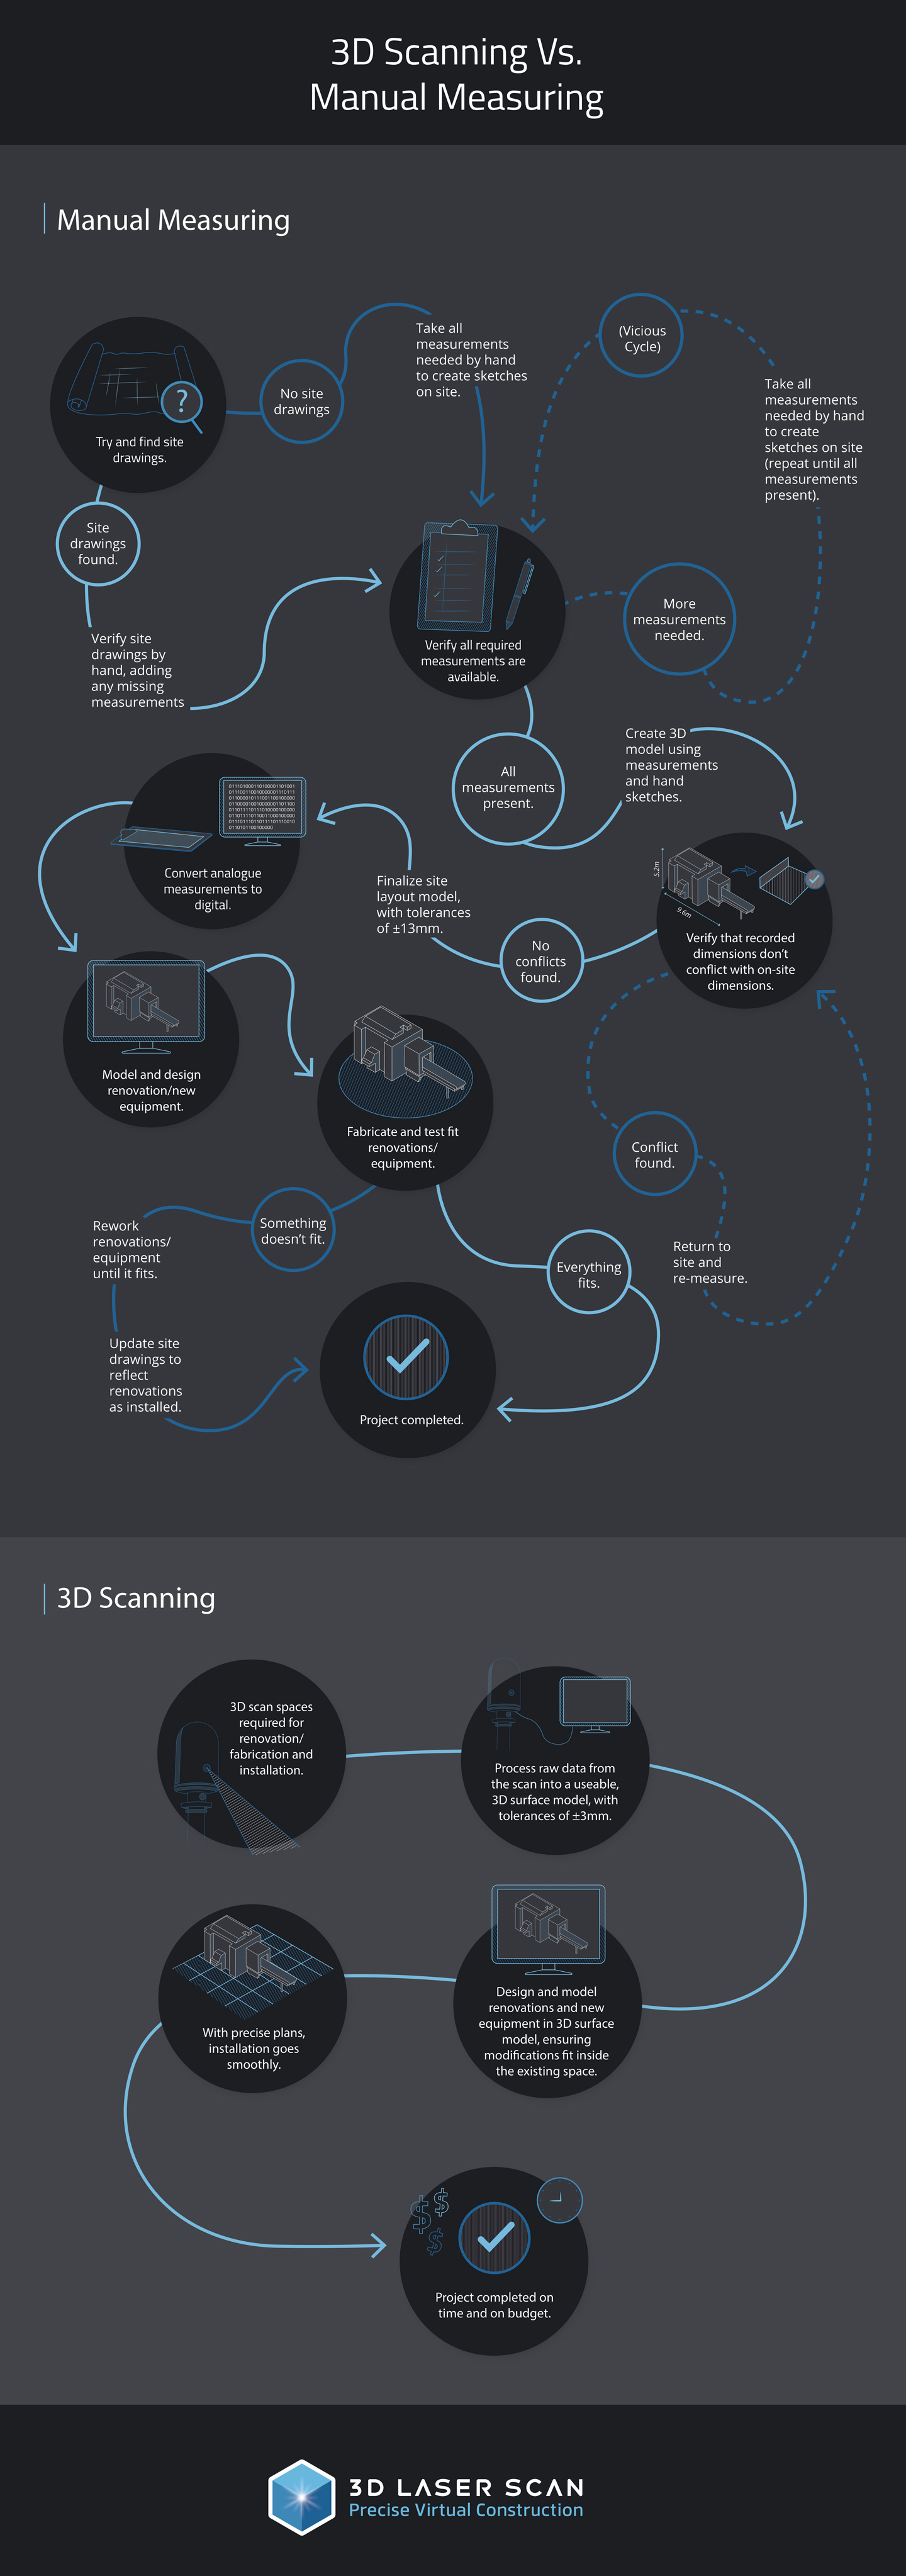 3D Scanning vs Manual Measuring Process